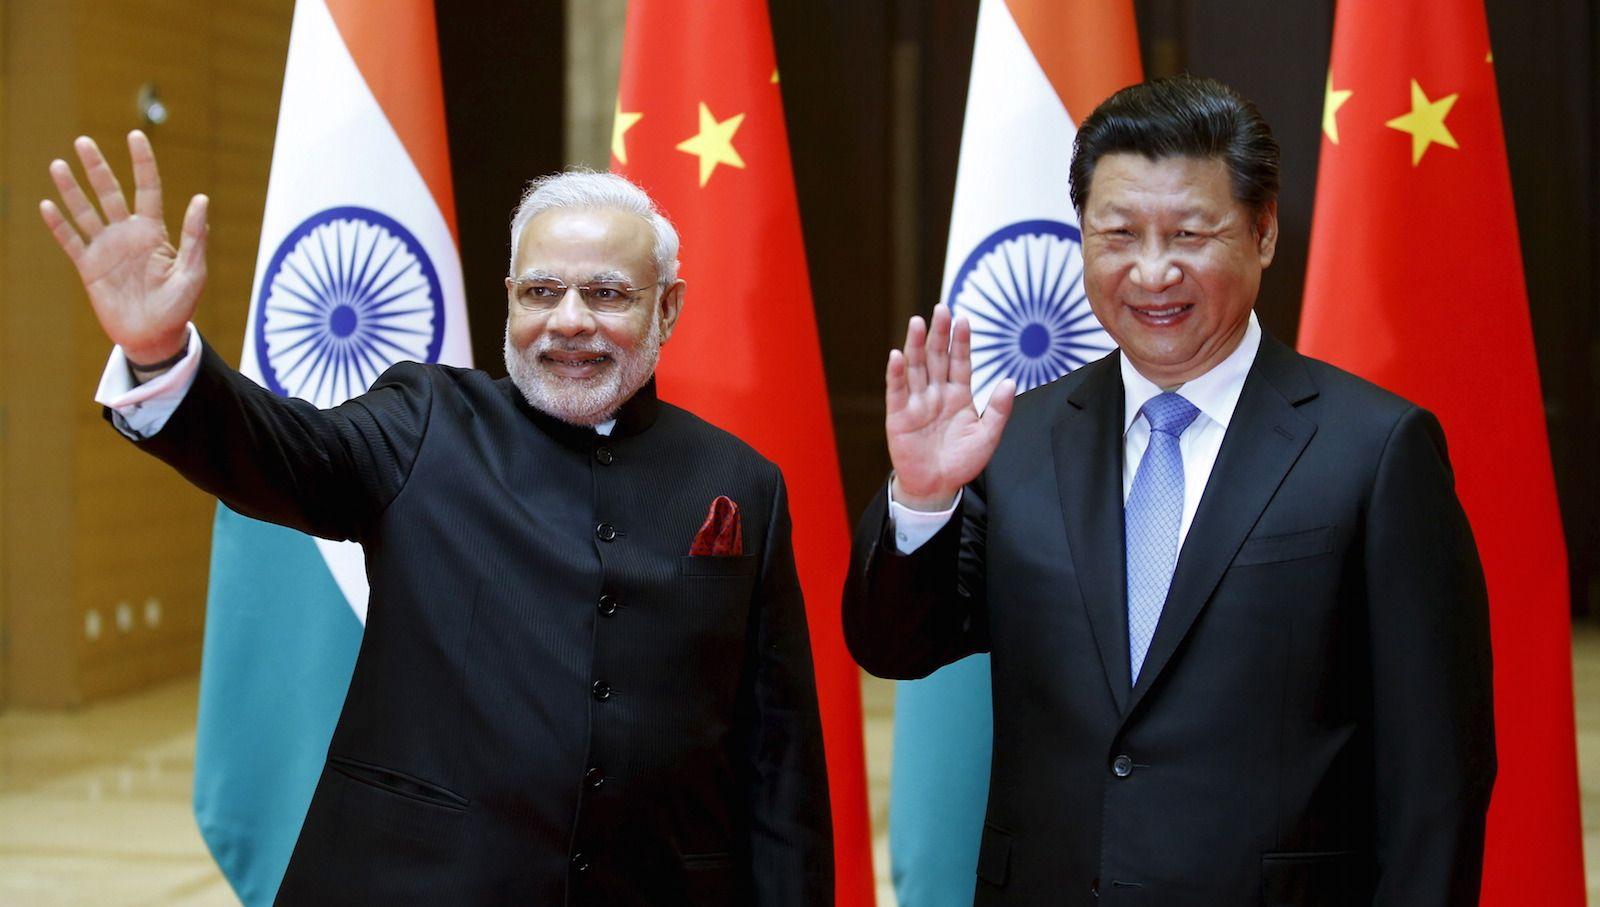 Xi, Modi, Doklam, border skirmish, Sino-Indian relationship, trade, Bhutan, Arunachal Pradesh, Pakistan, Hafiz Sayeed,South China Sea,